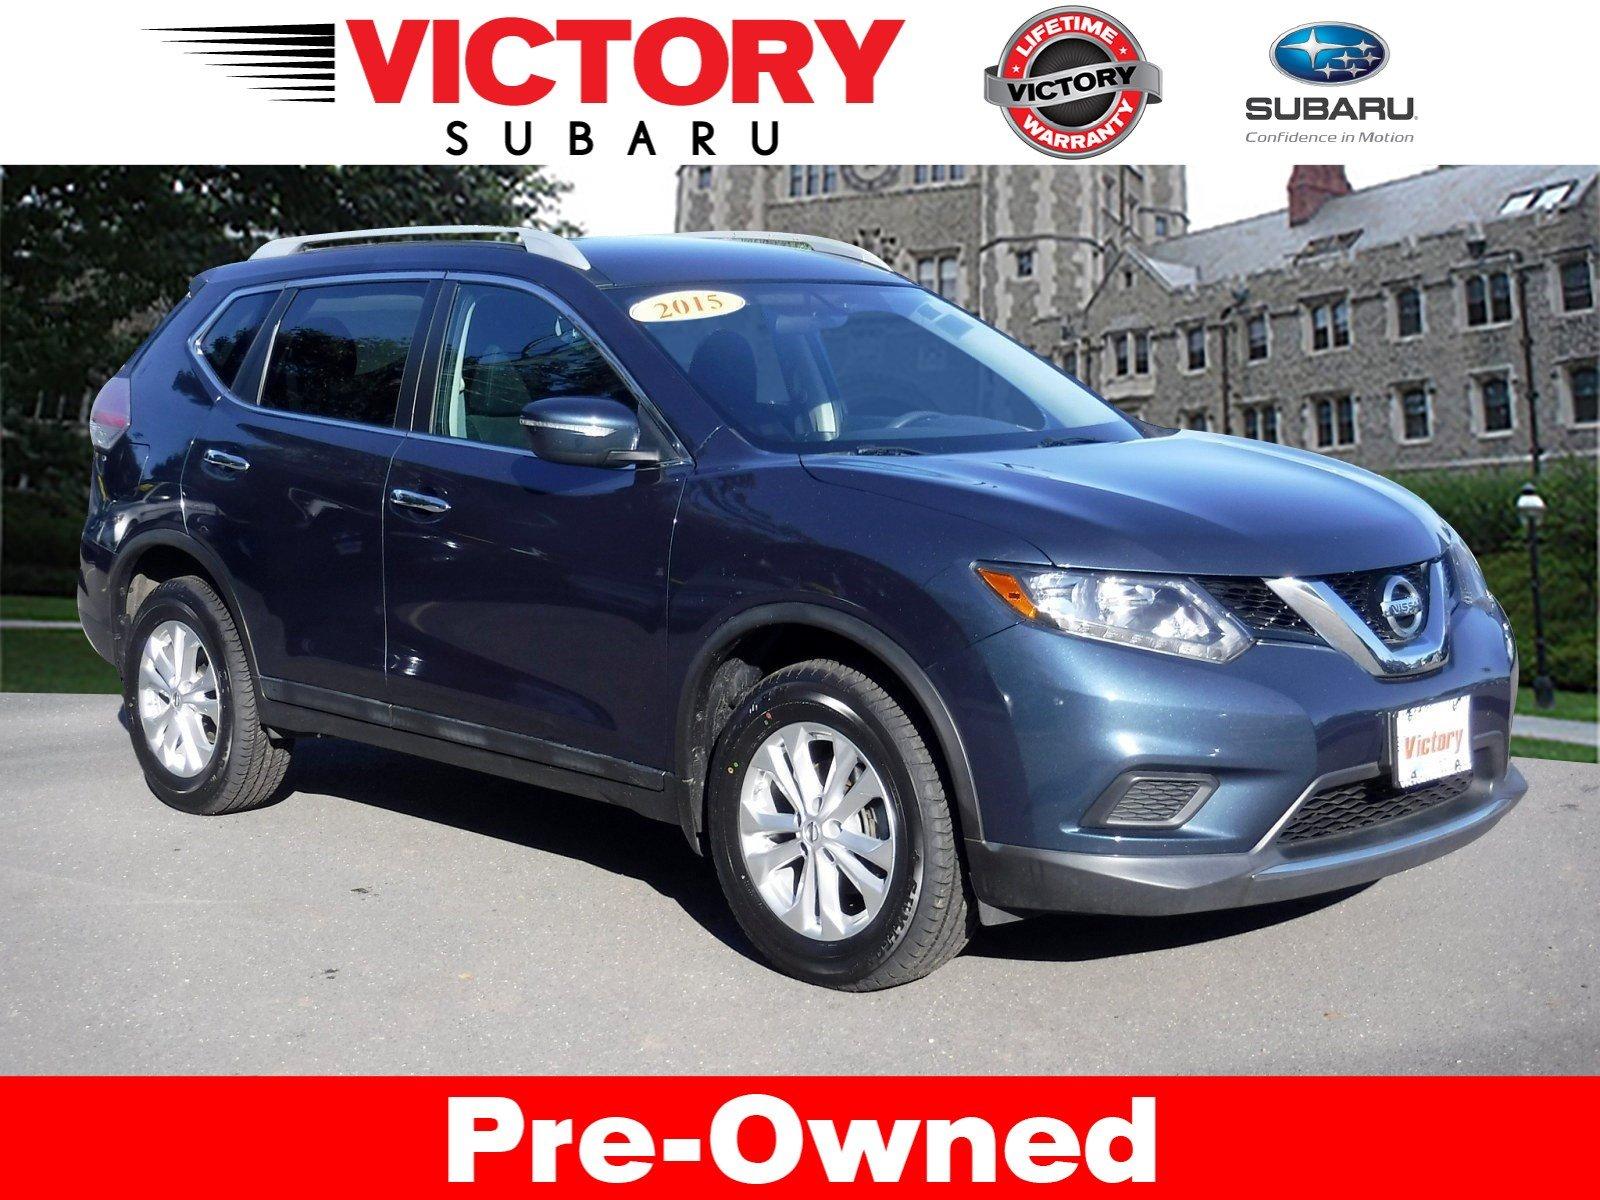 Subaru Dealers Nj >> Victory Subaru New And Used Vehicles Somerset Nj